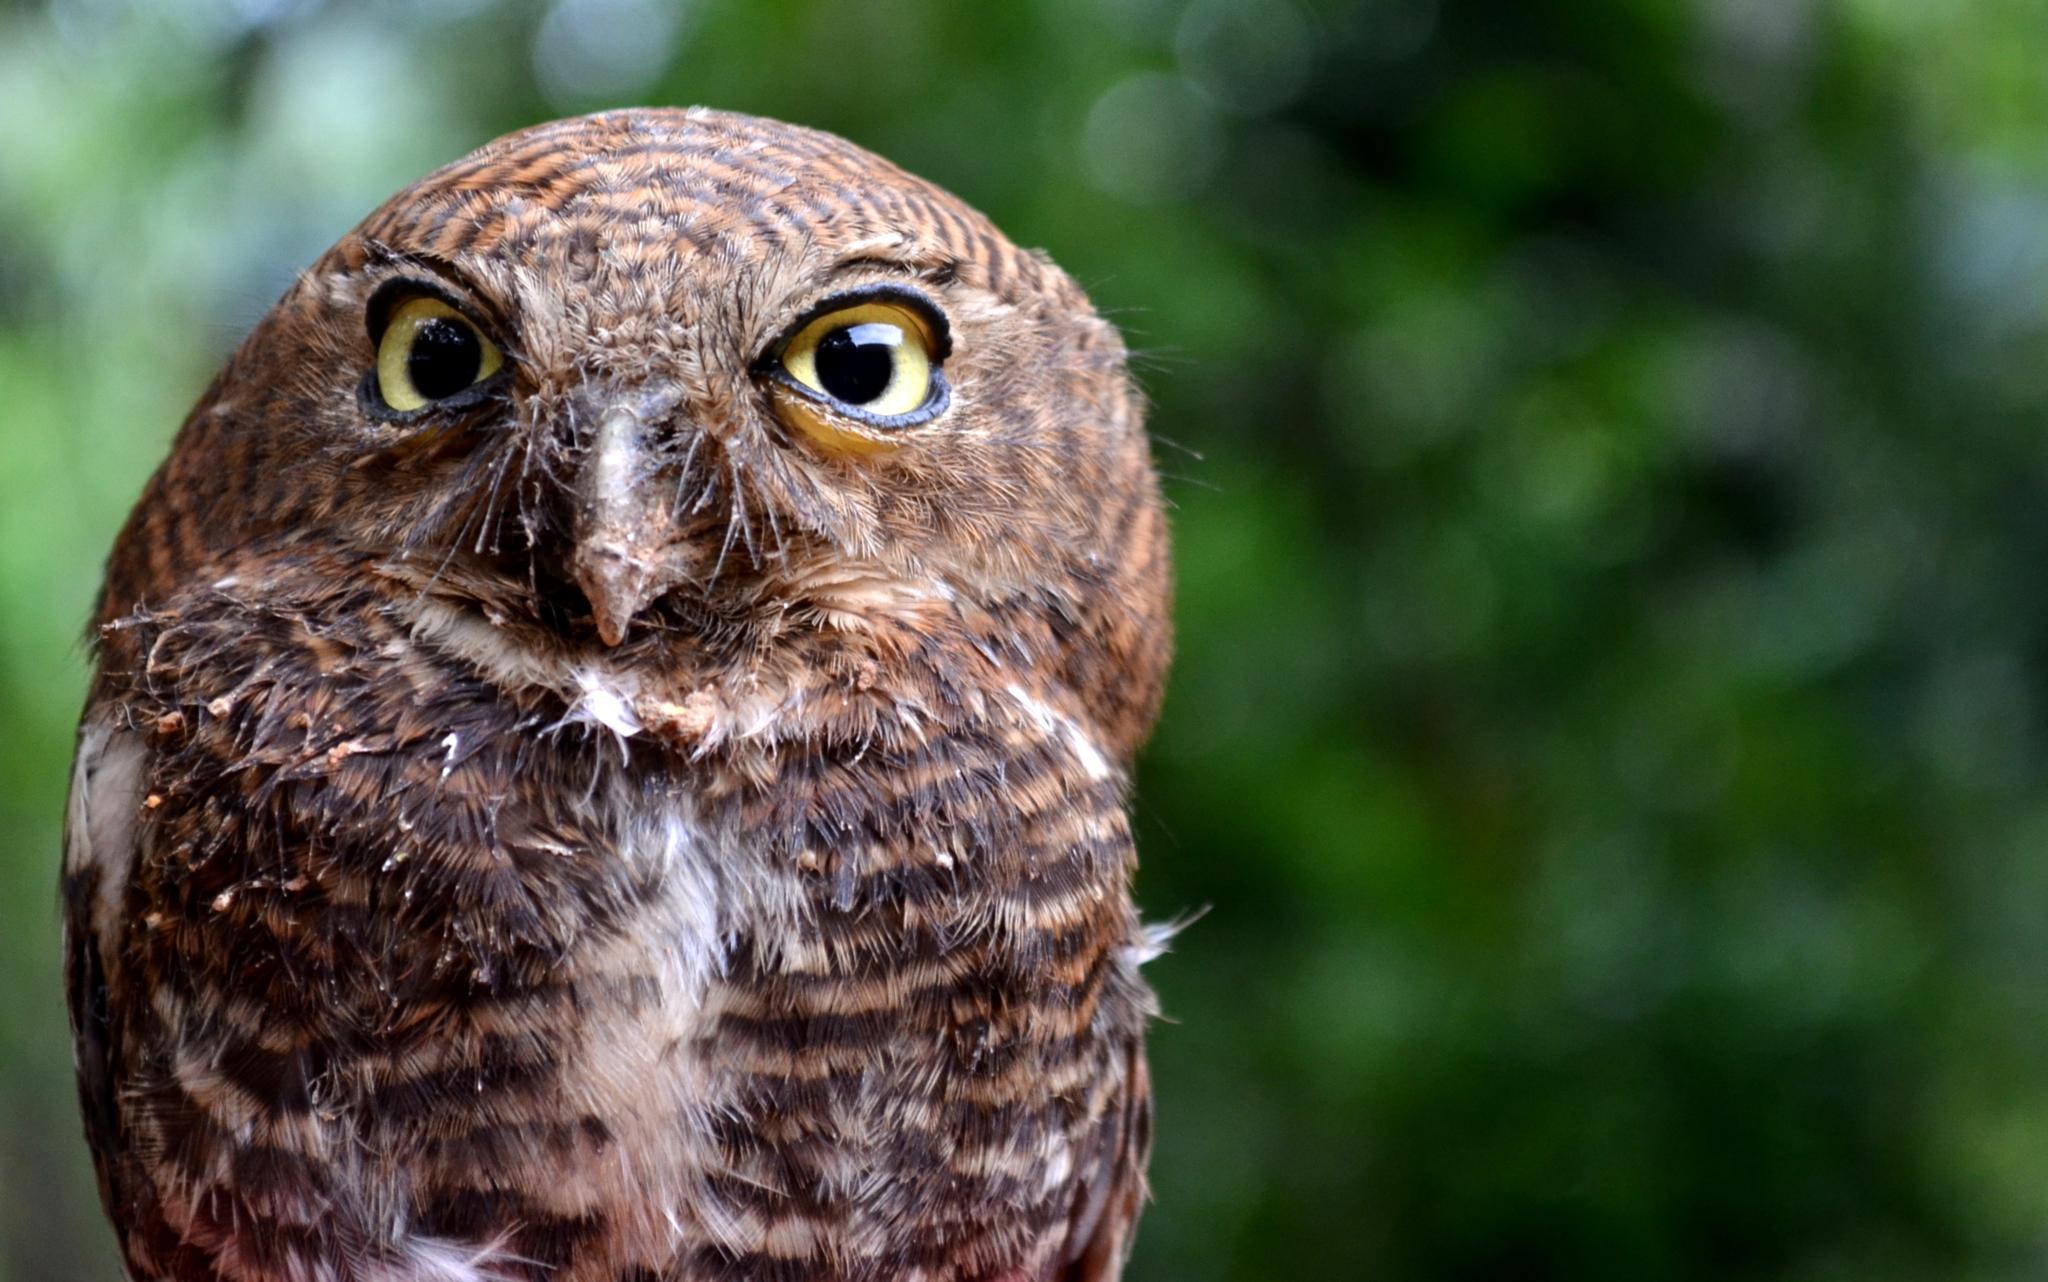 Jungle Owlet by Pradeep Krishnan